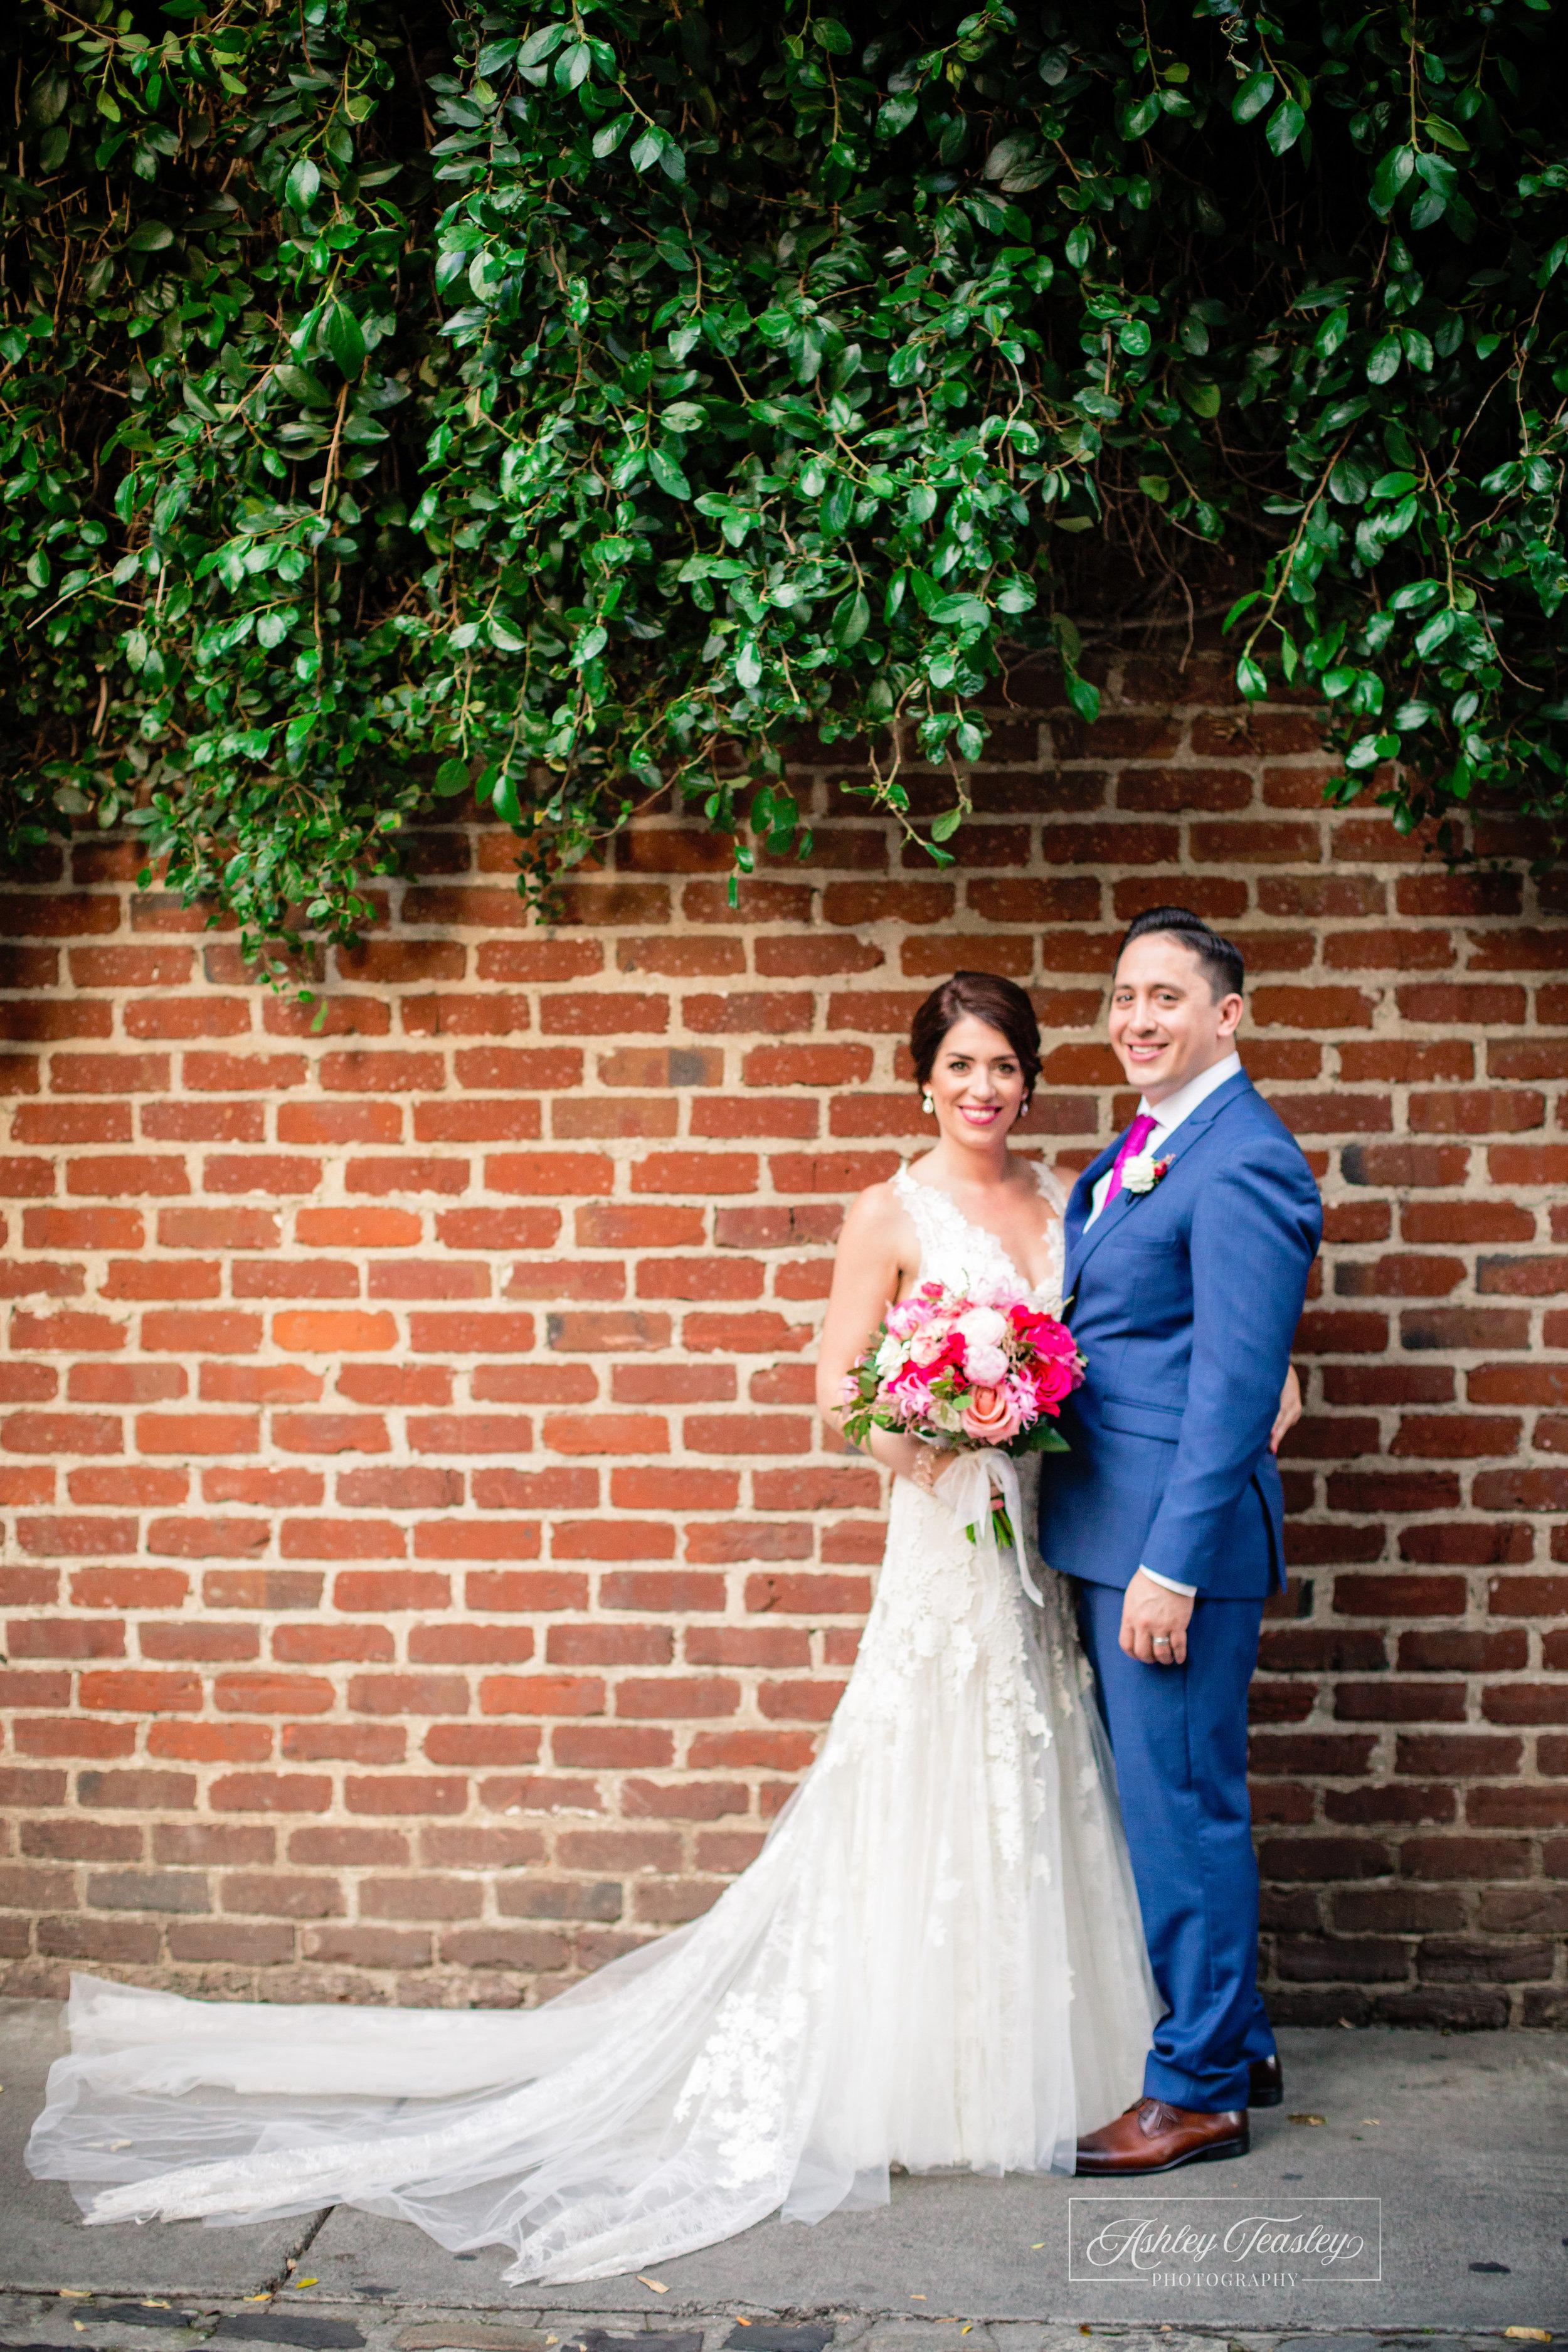 Tarrah & Francisco - The Kimpton Sawyer Hotel - The Firehouse Old Sac - Sacramento Wedding Photographer - Ashley Teasley Photography (47 of 118).jpg